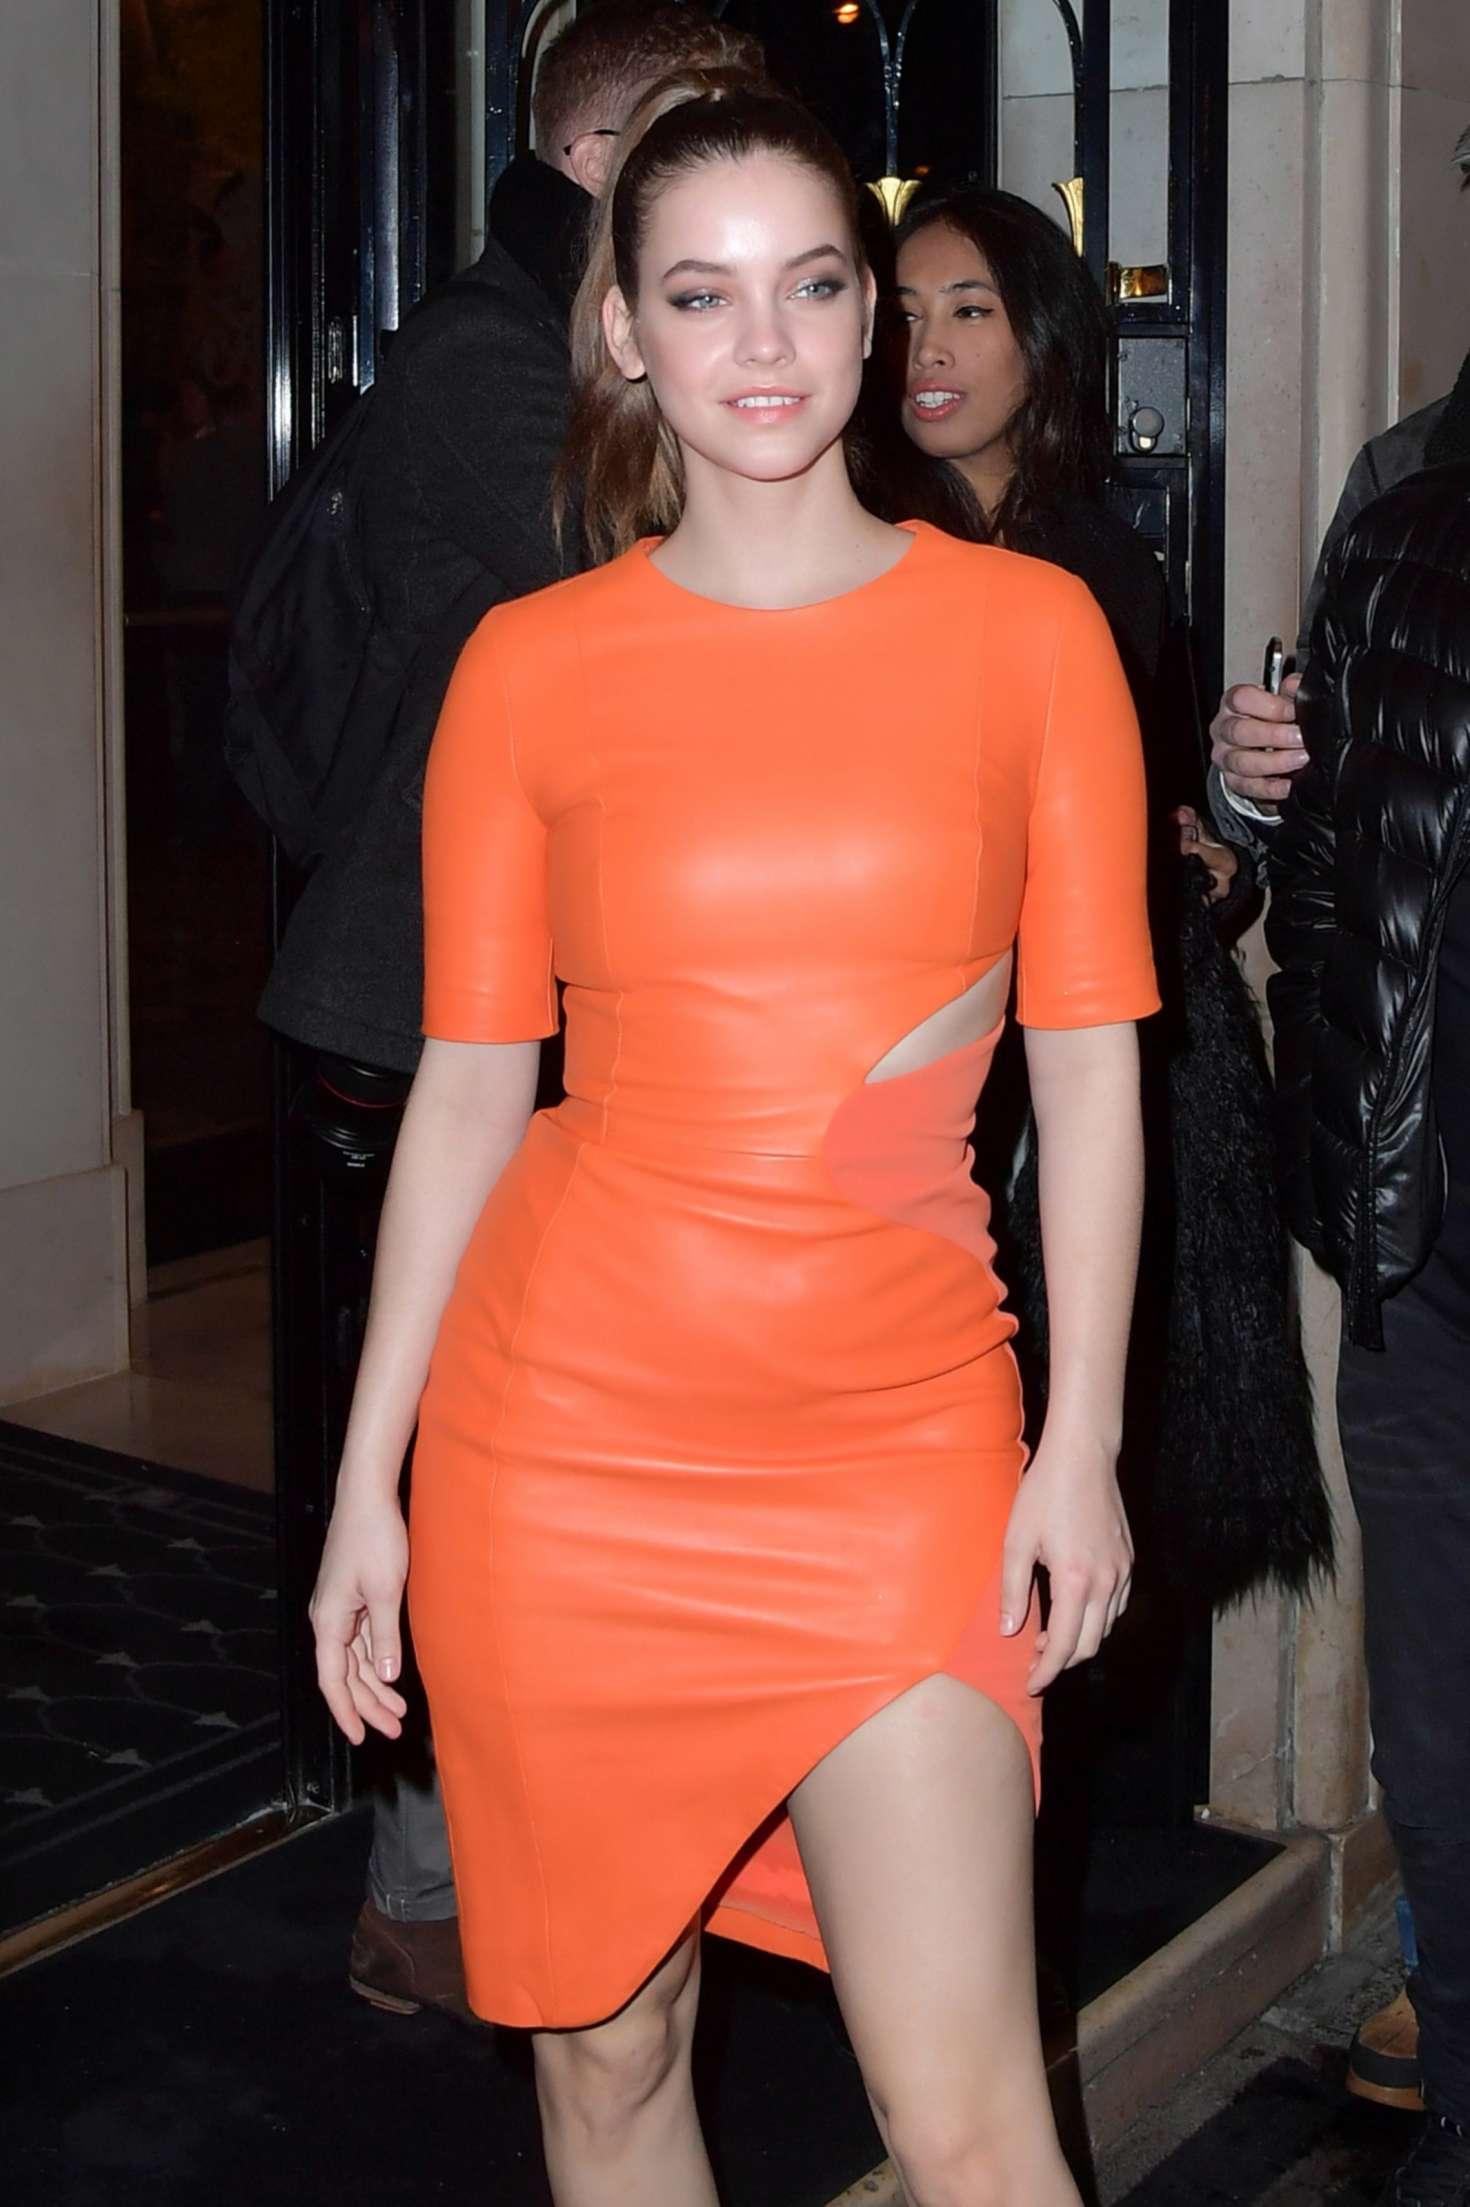 Barbara Palvin In Orange Leather Dress In Paris Gotceleb